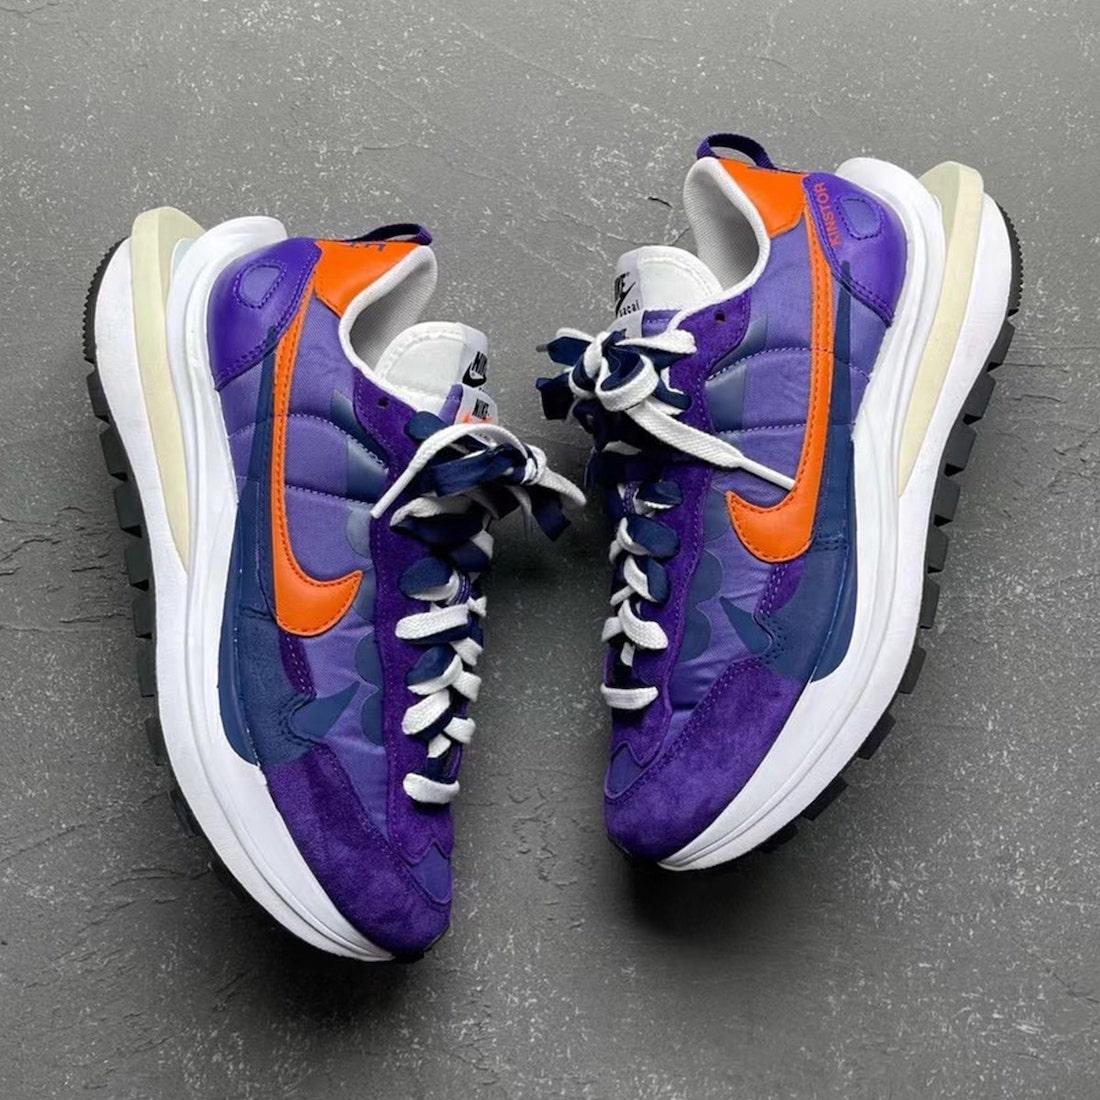 Sacai Nike VaporWaffle Dark Iris Release Date